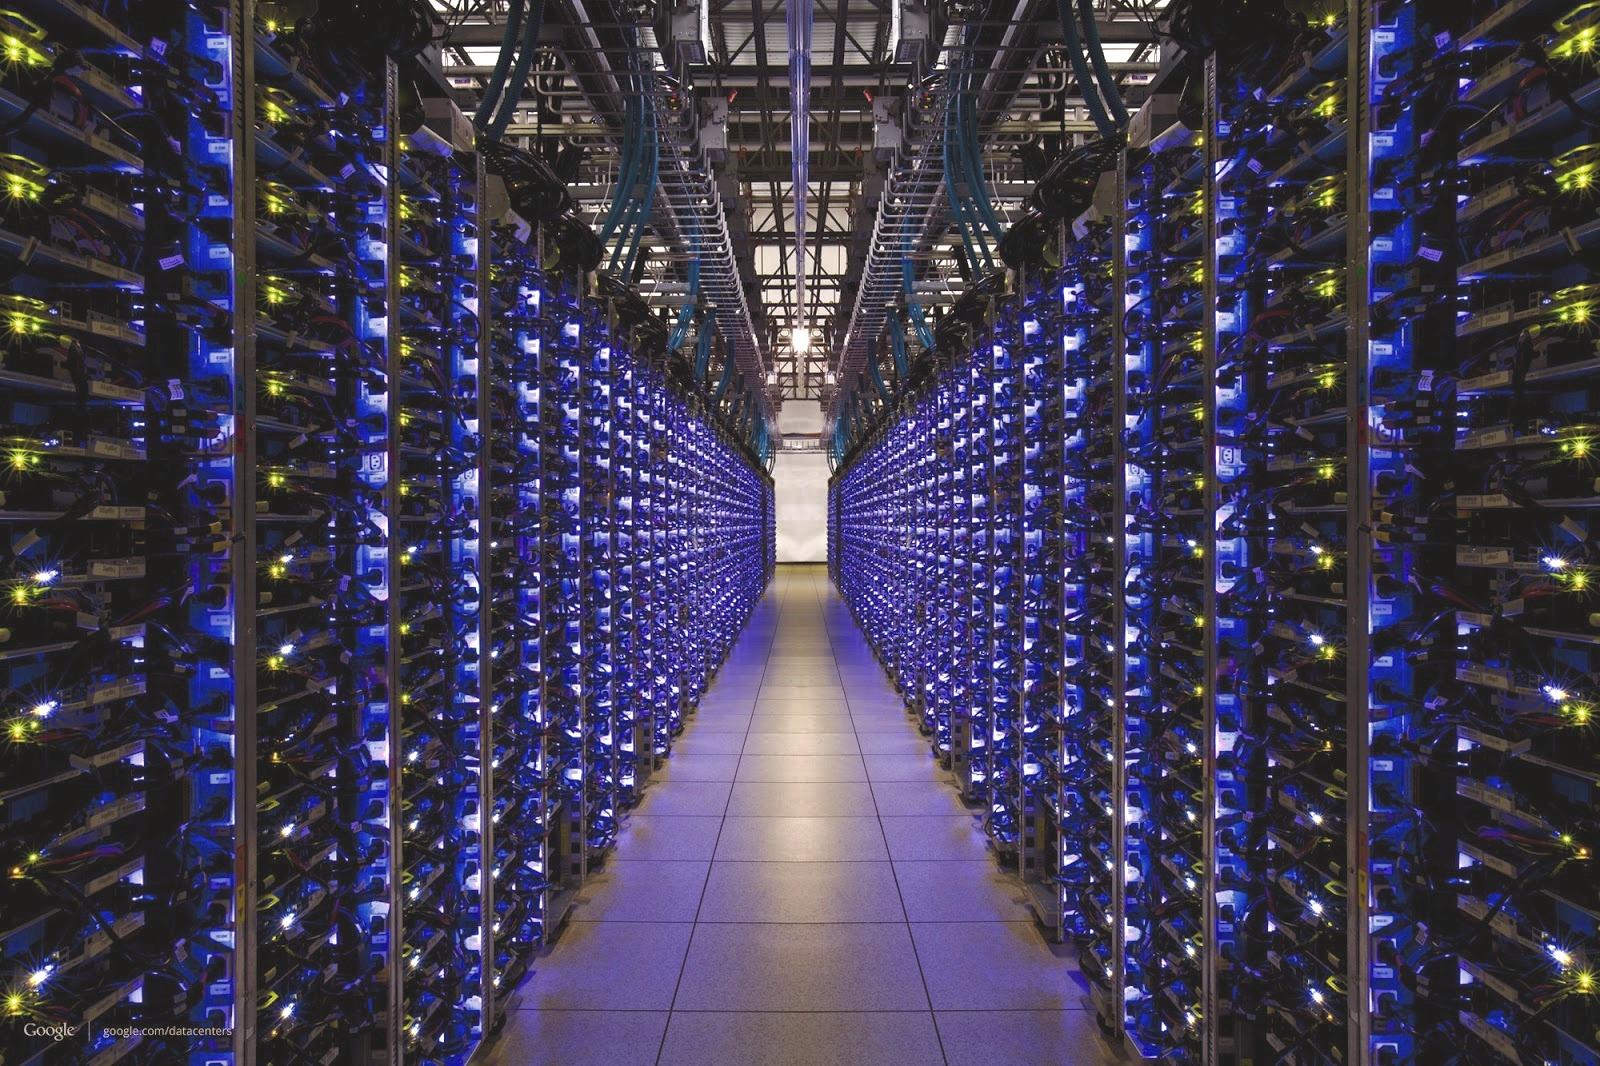 google-datacenter-tech-13_edited_edited.